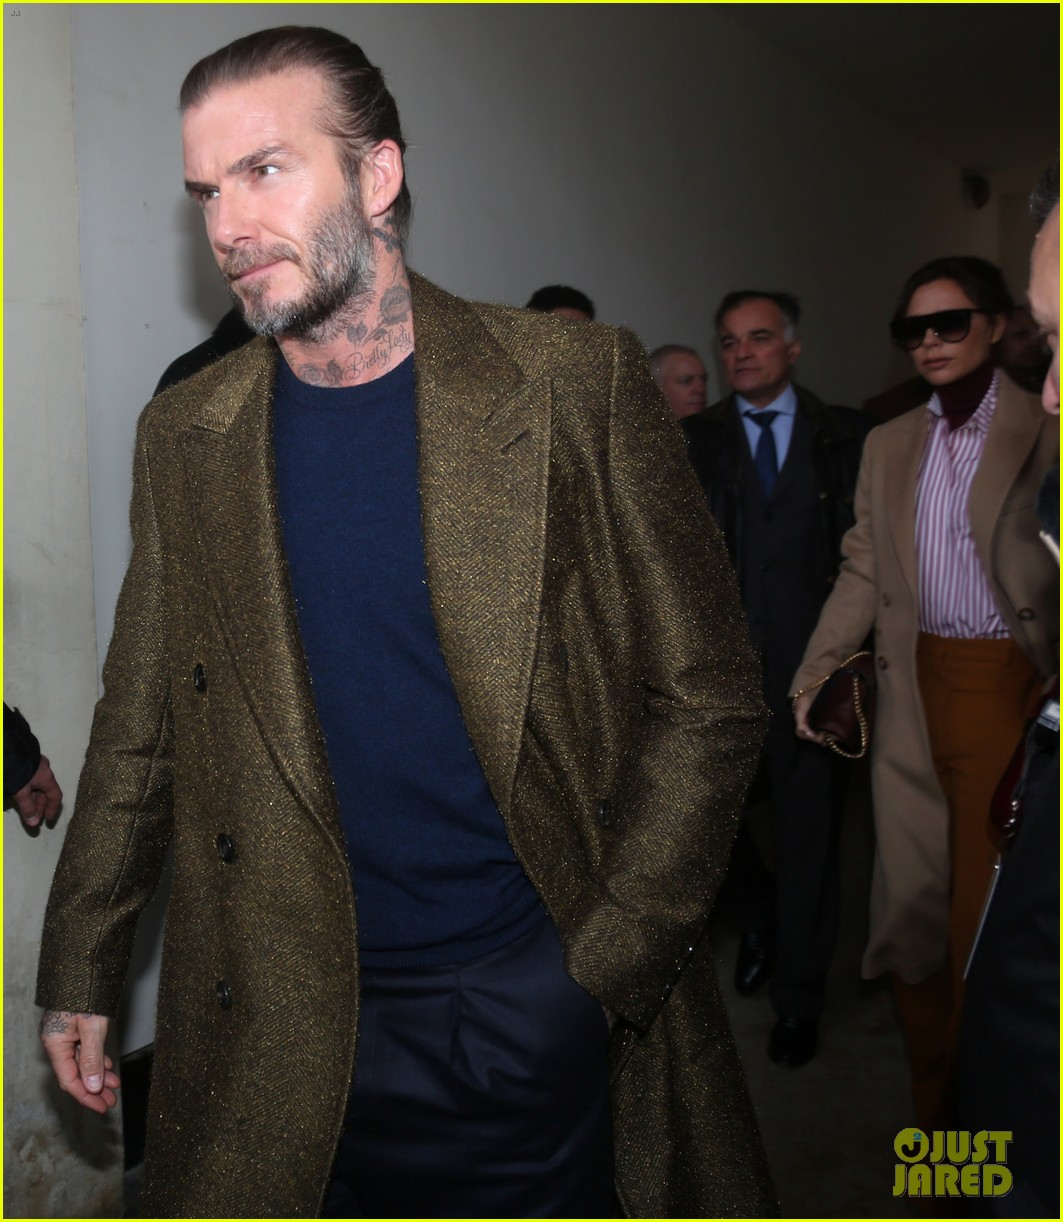 Brooklyn Beckham confirms Chloe Moretz split as he